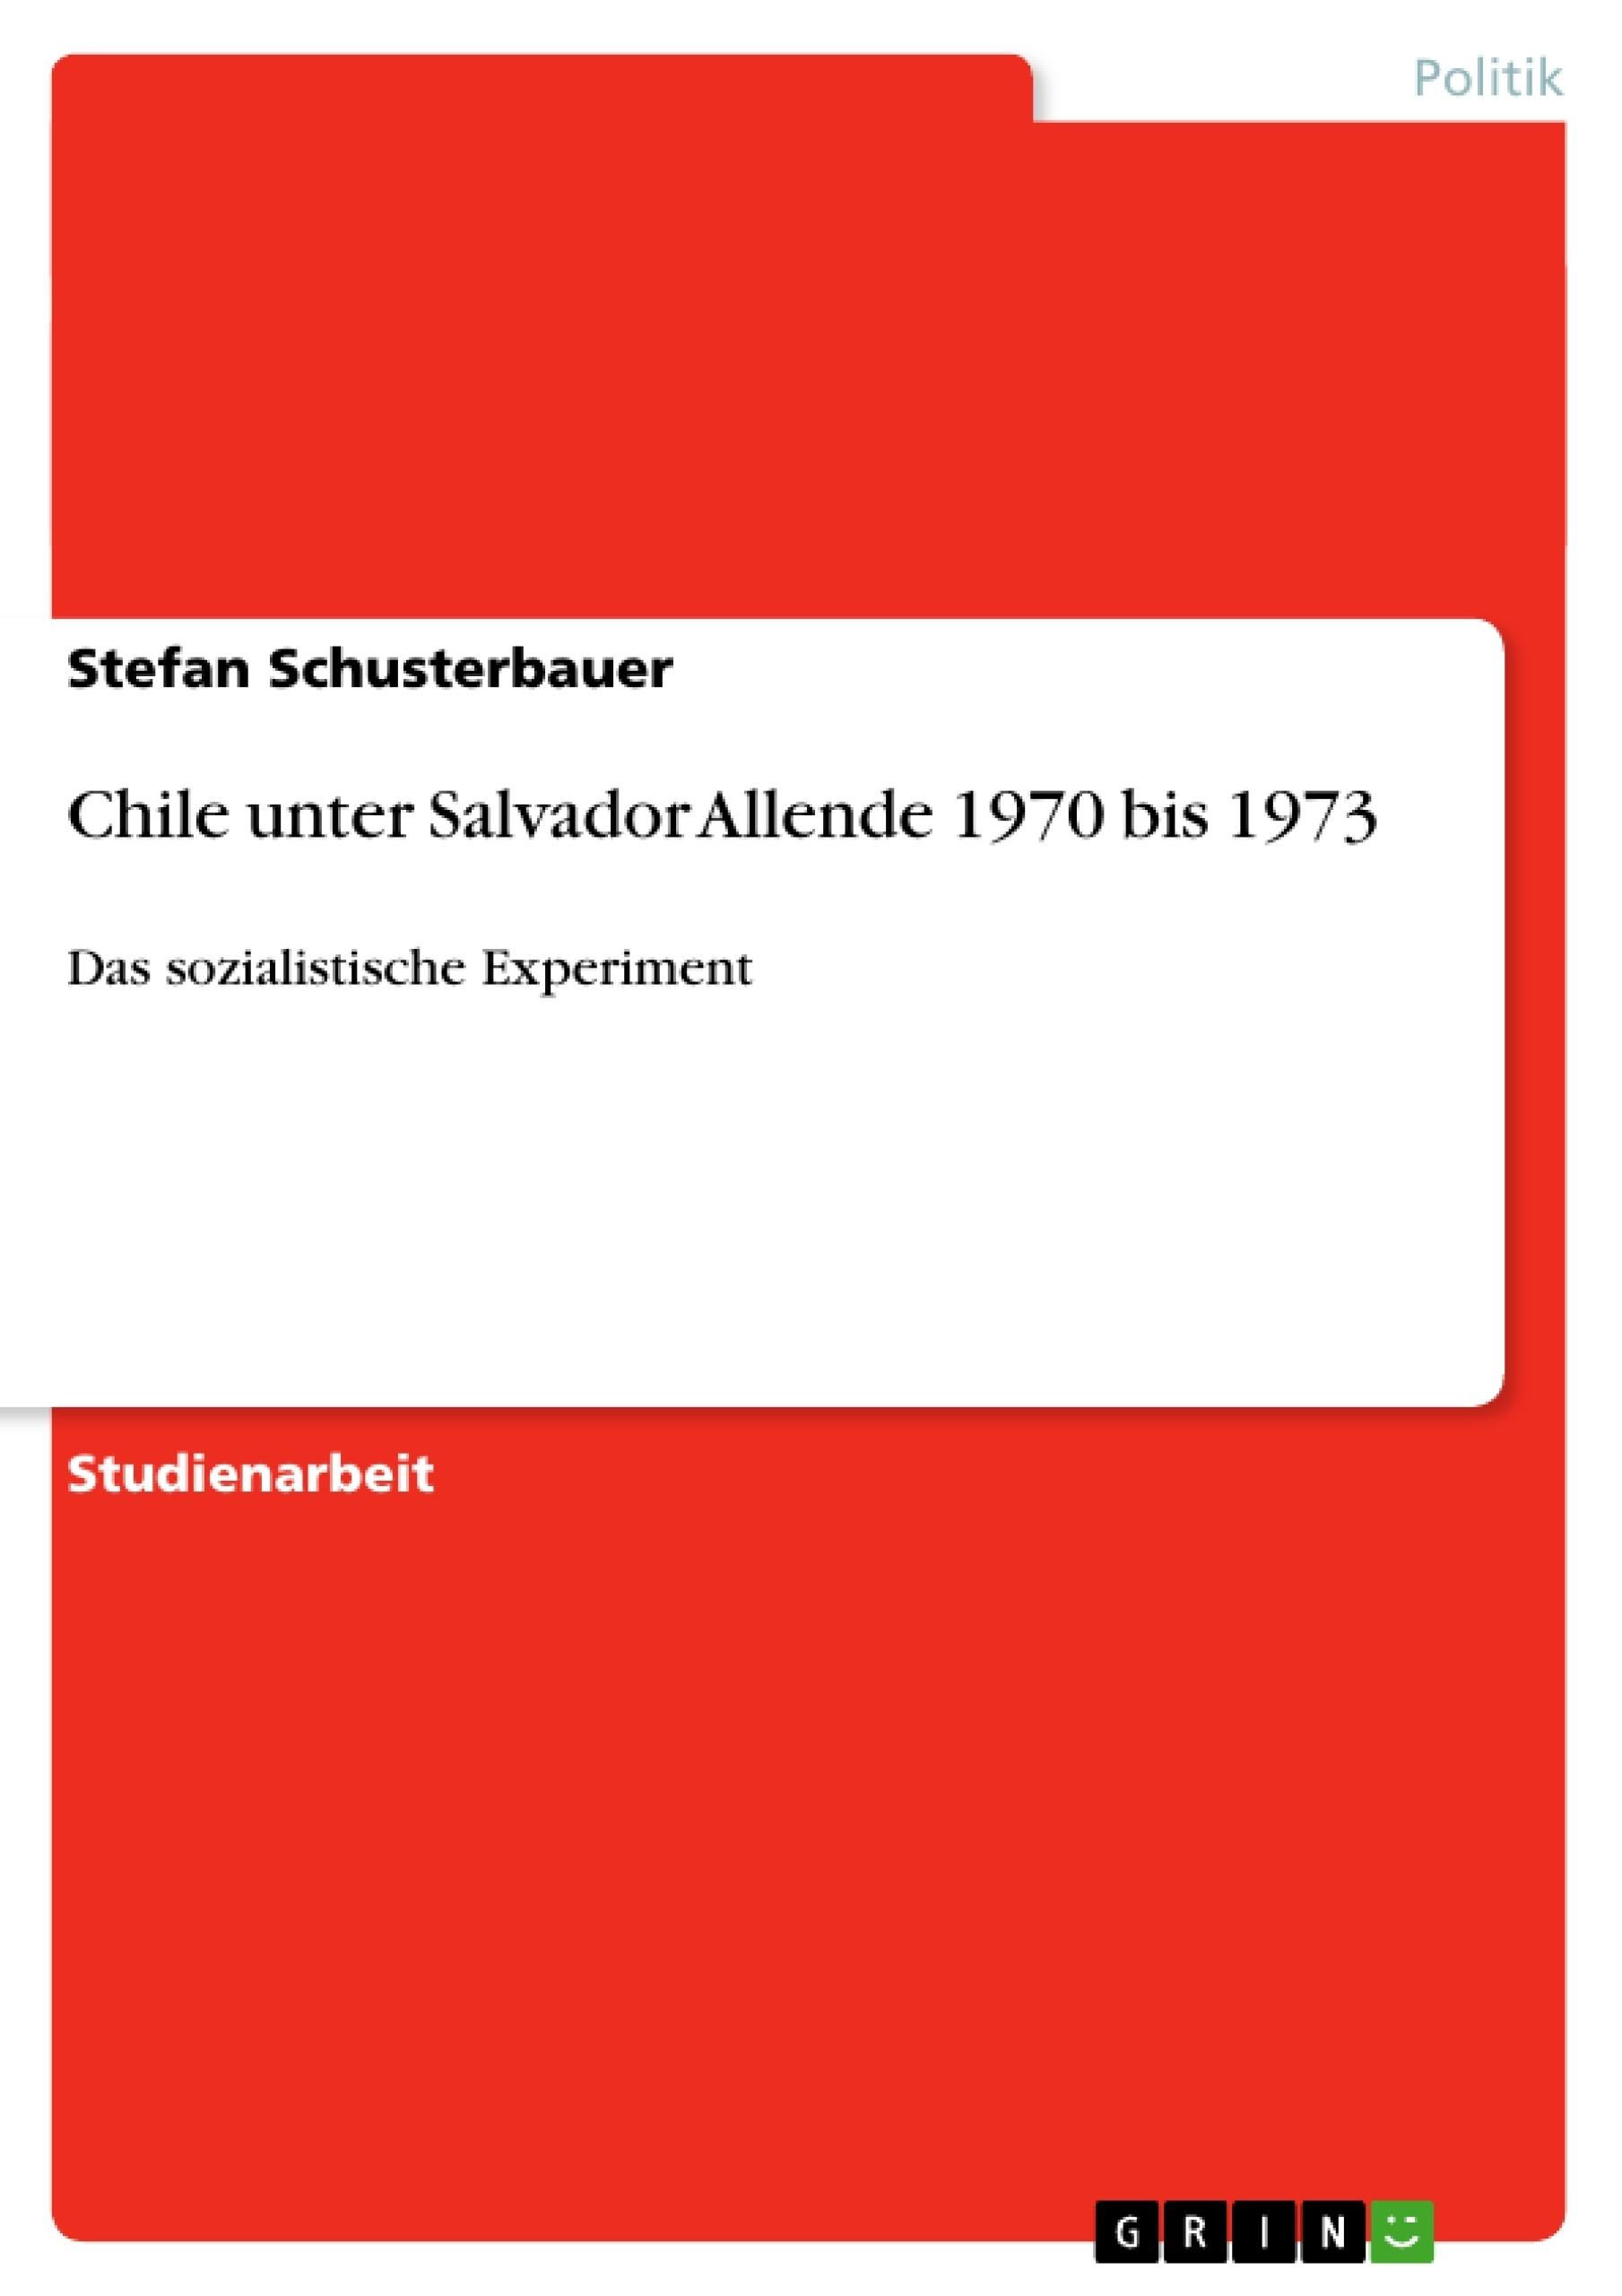 Titel: Chile unter Salvador Allende 1970 bis 1973